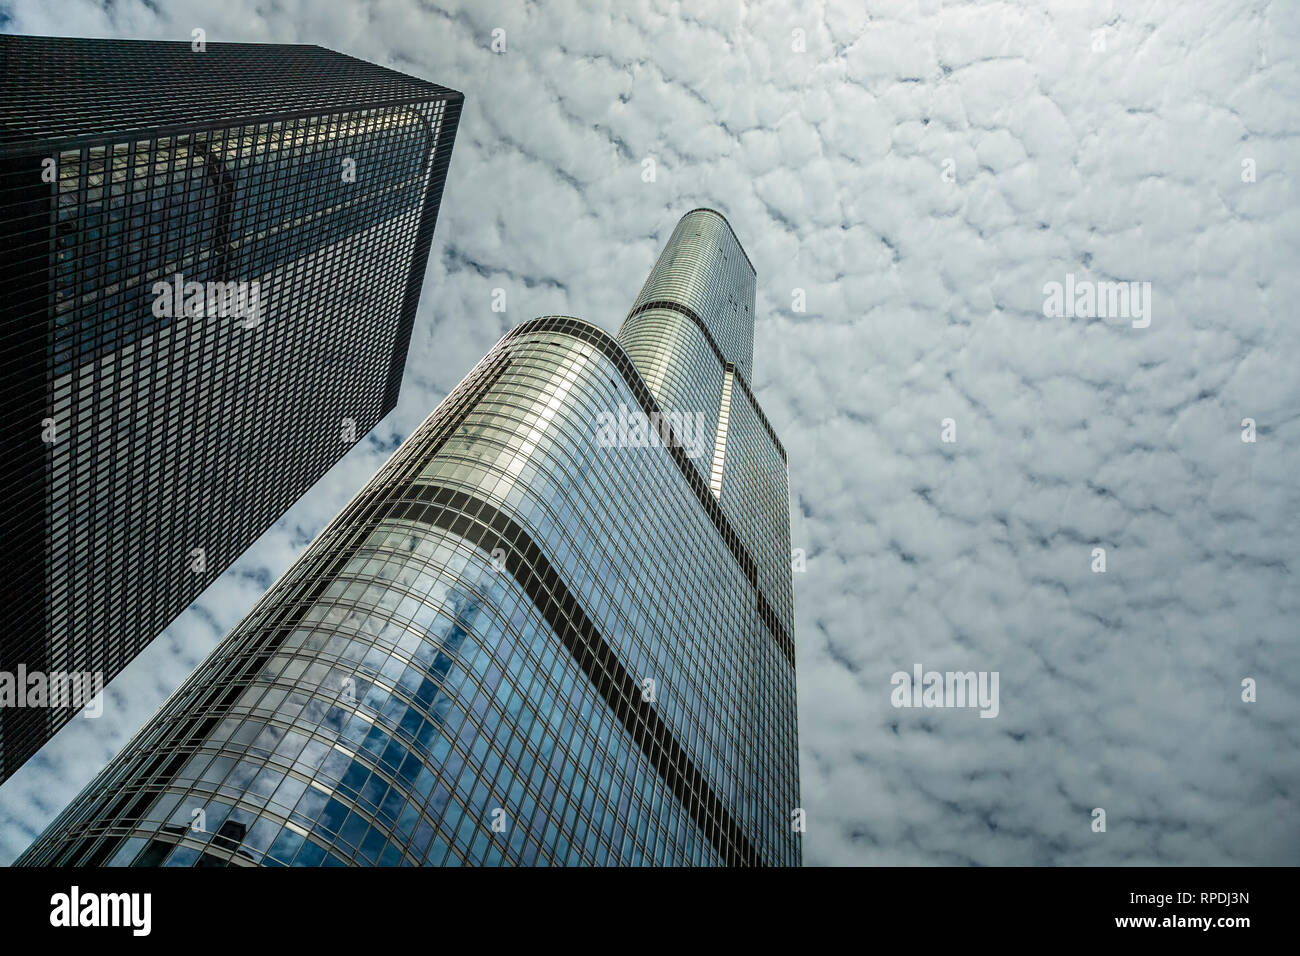 Trump Tower, Chicago, Illinois USA - Stock Image